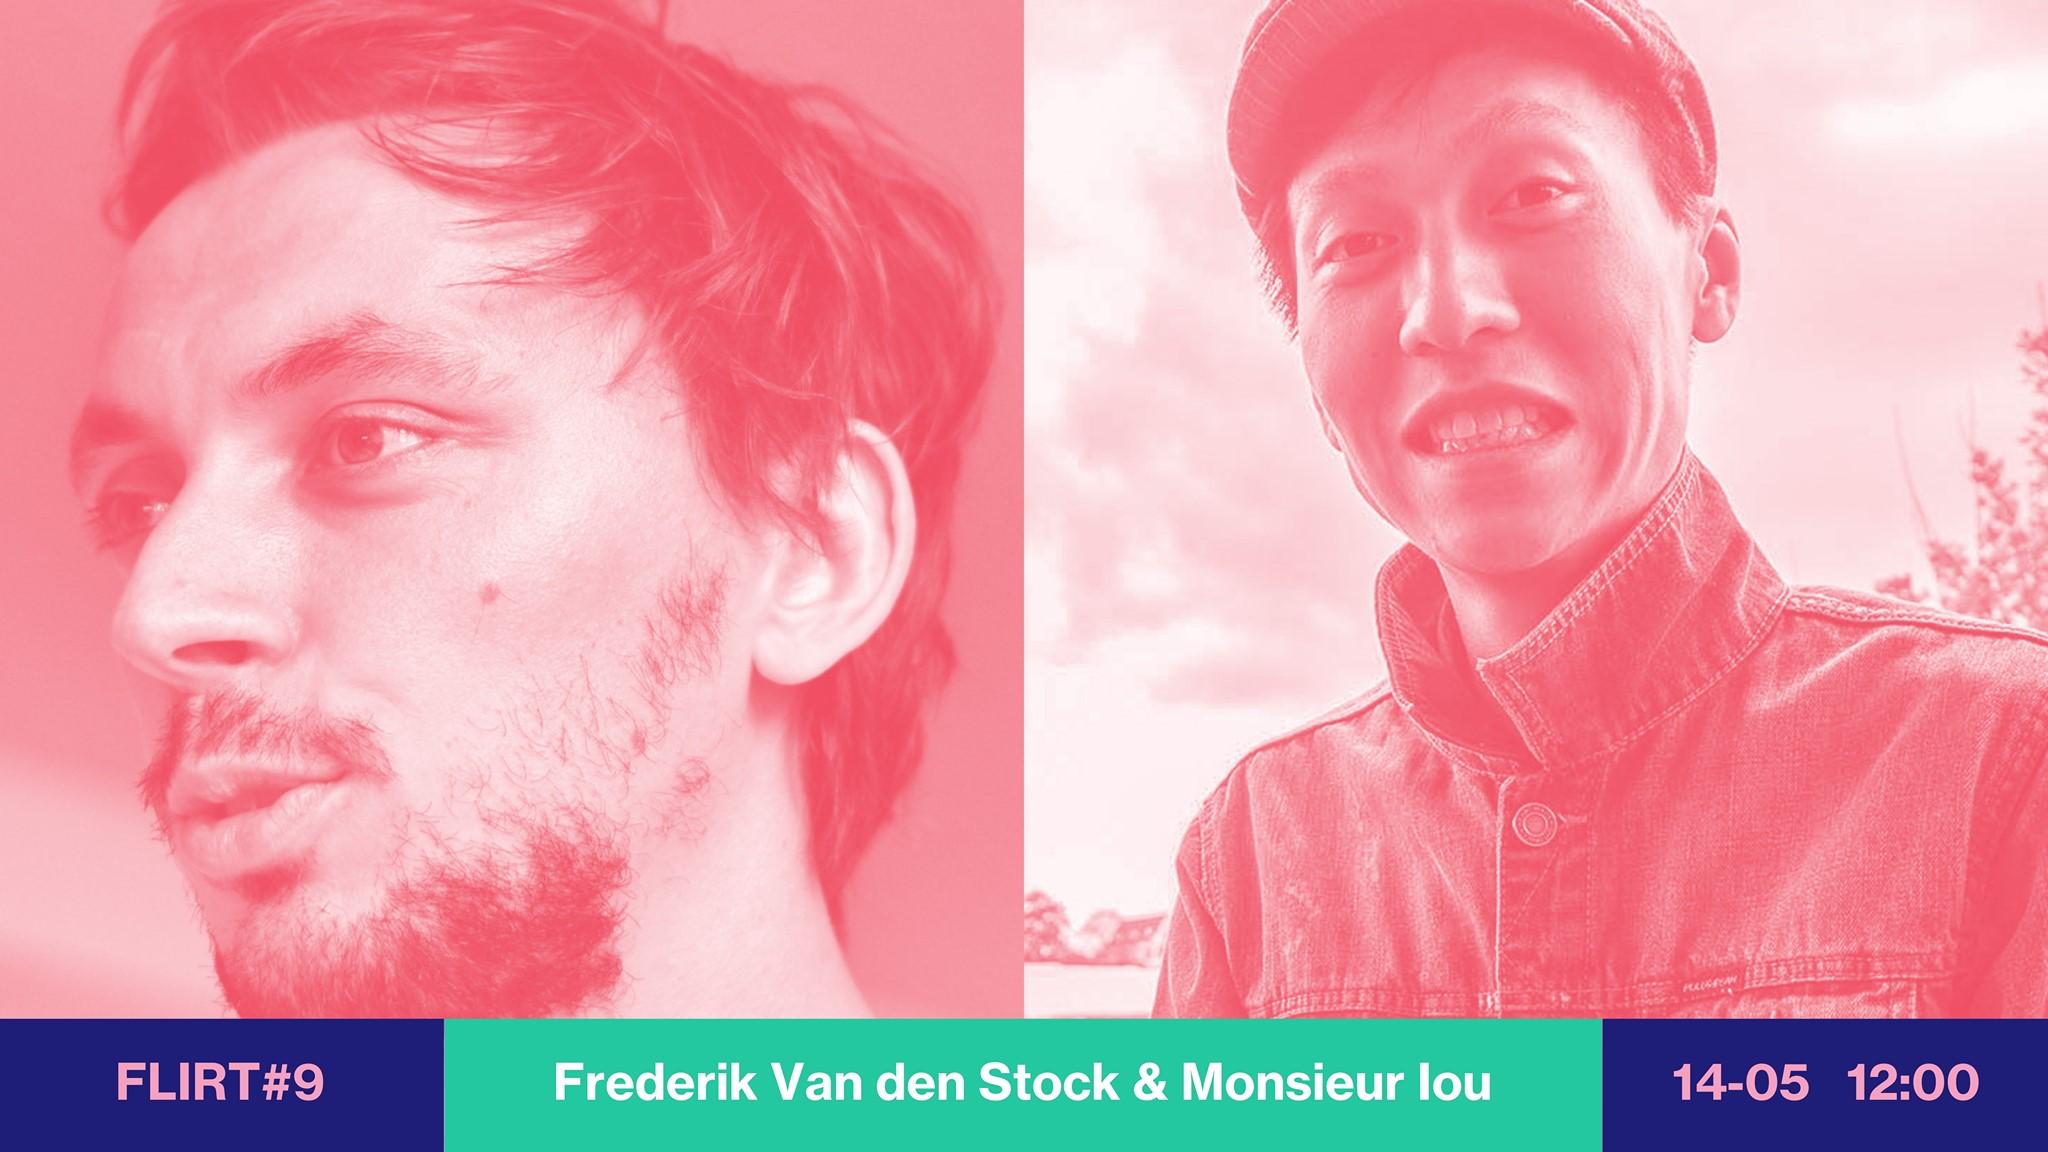 FLIRT #9 Frederik Van den Stock & Monsieur Iou